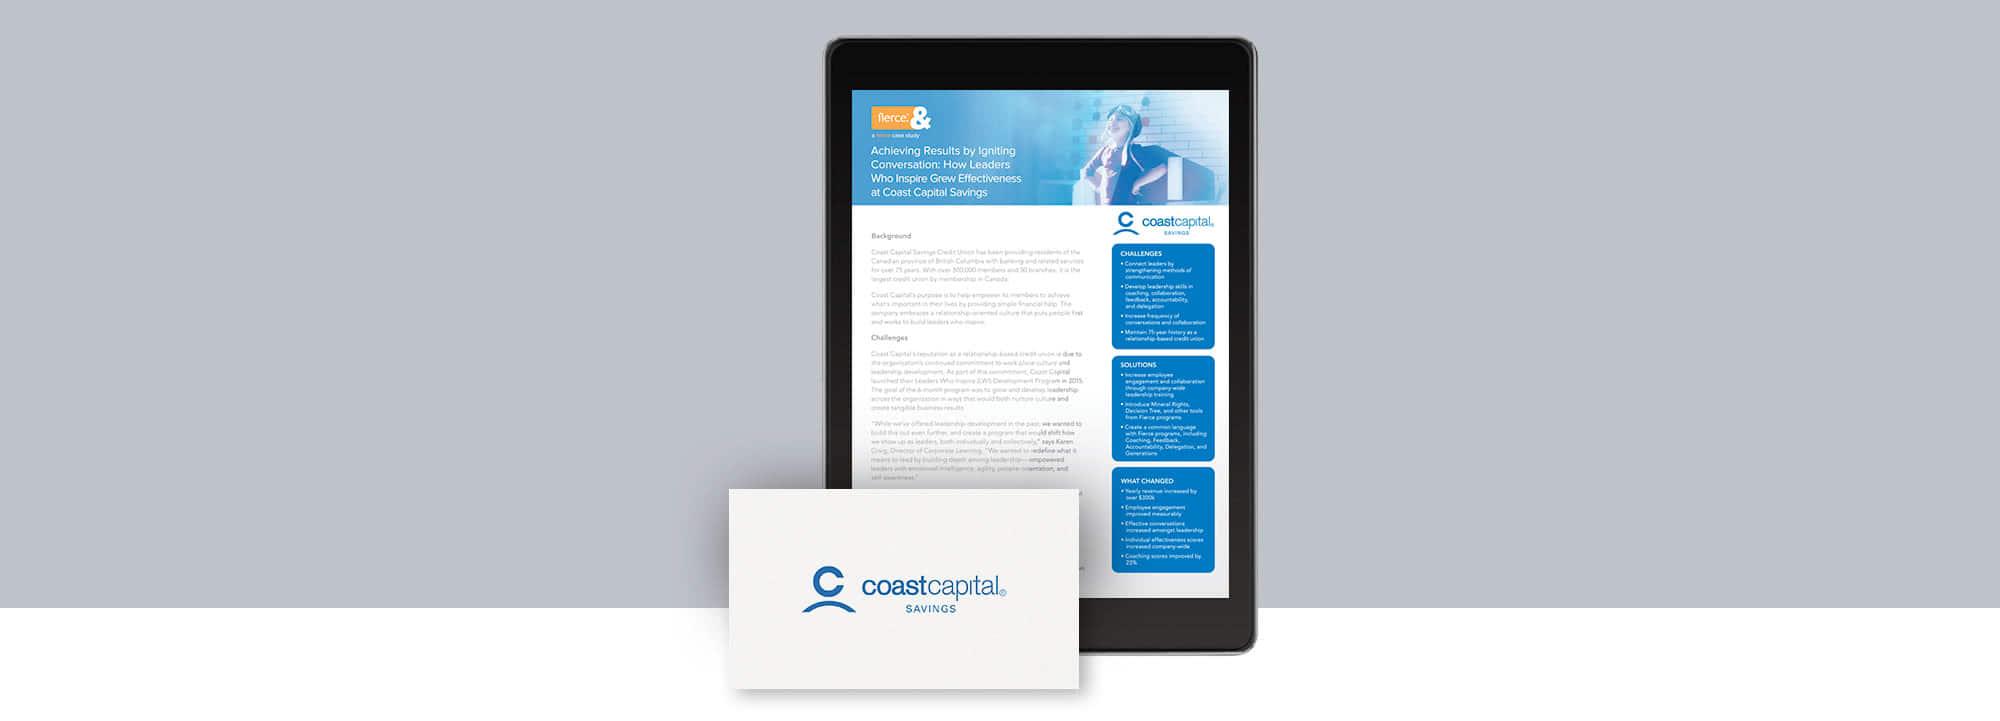 Fierce Conversations Coast Capital Savings Case Study